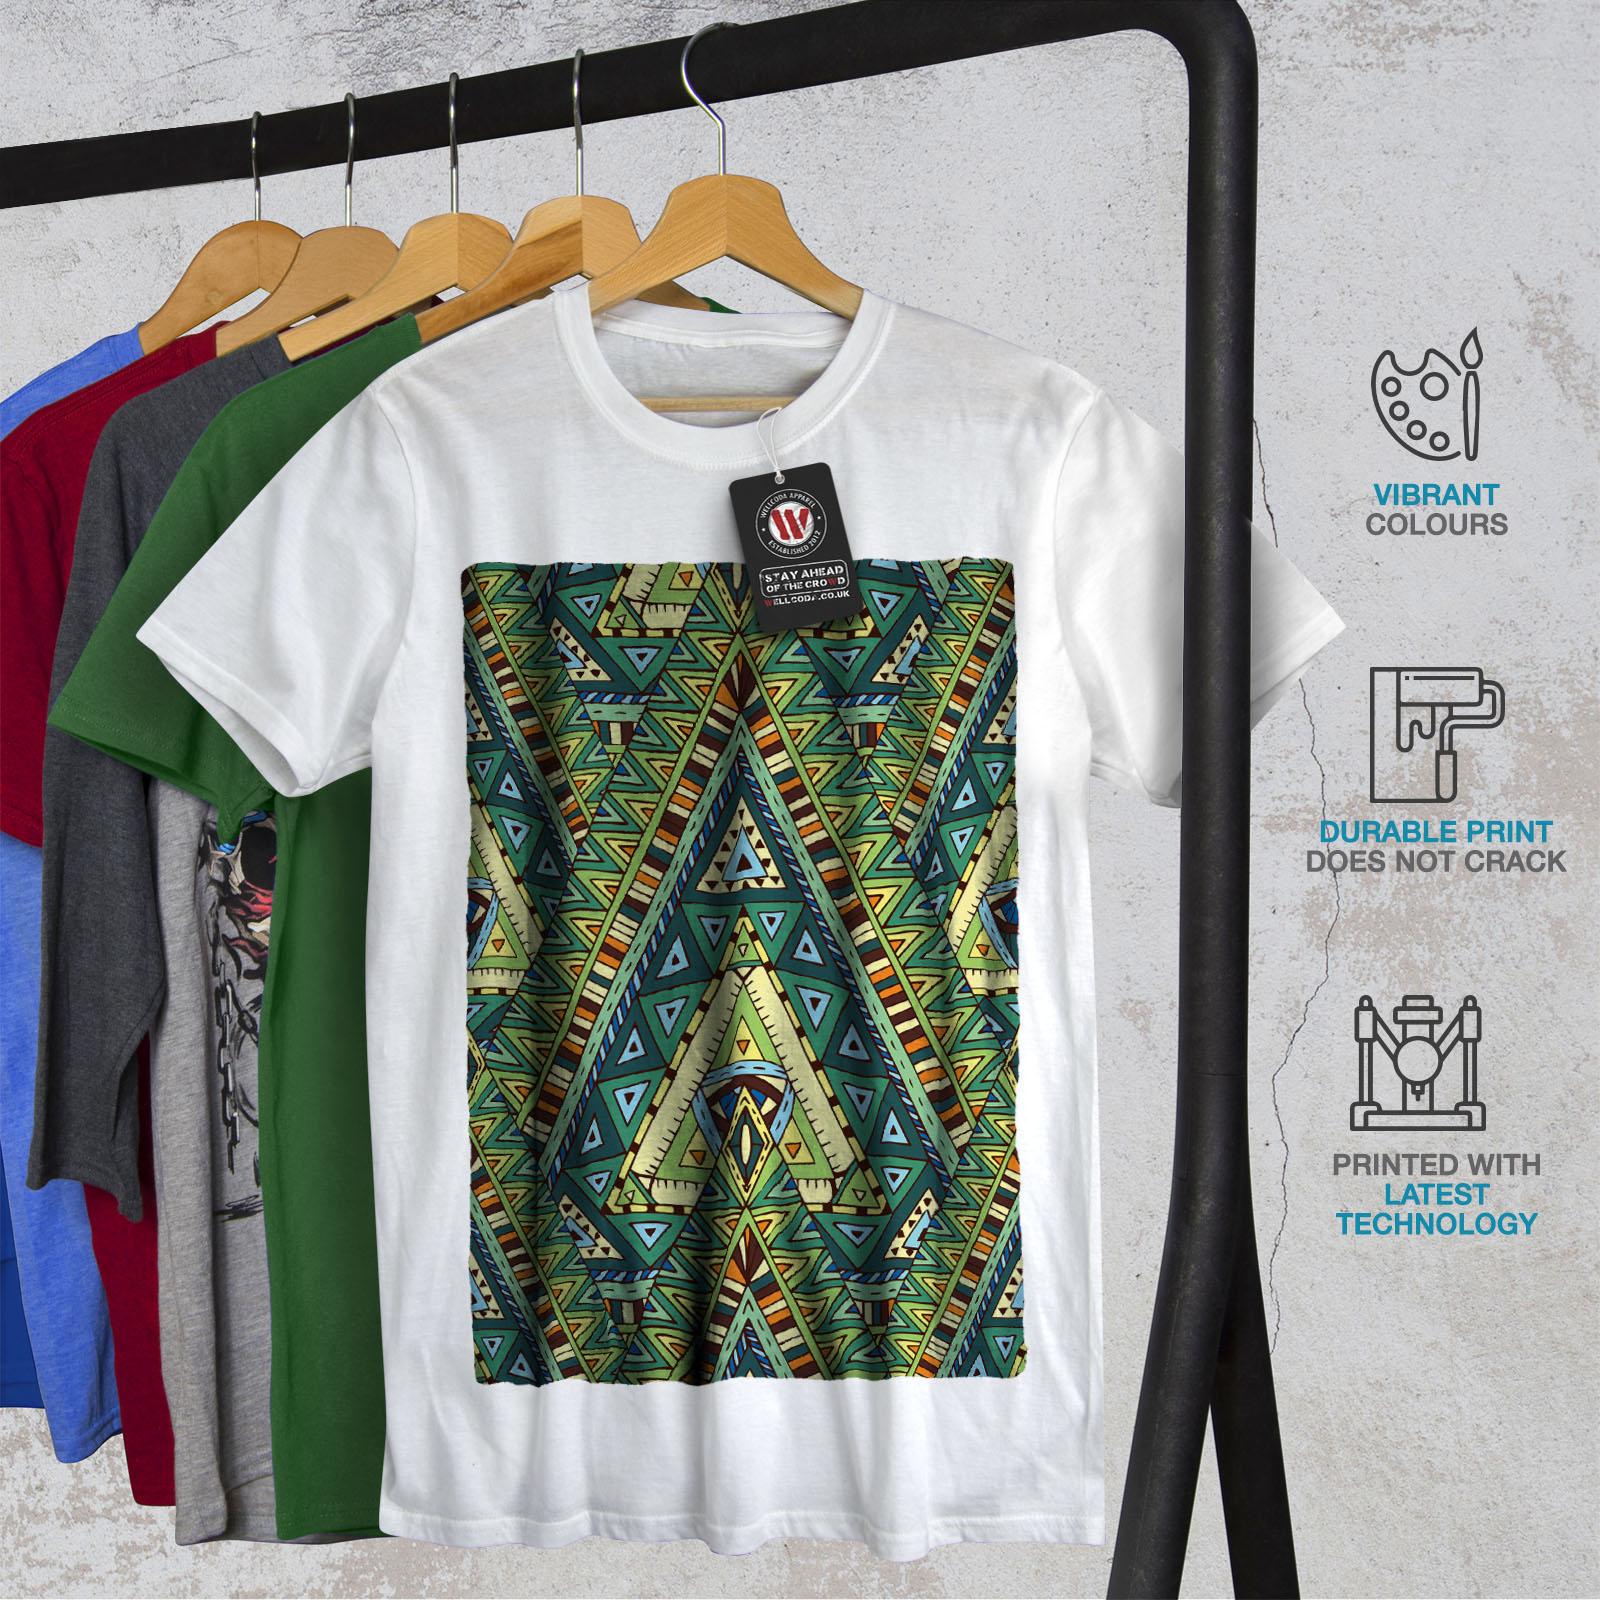 Wellcoda Spirit Pattern Mens Long Sleeve T-shirt Colorful Graphic Design